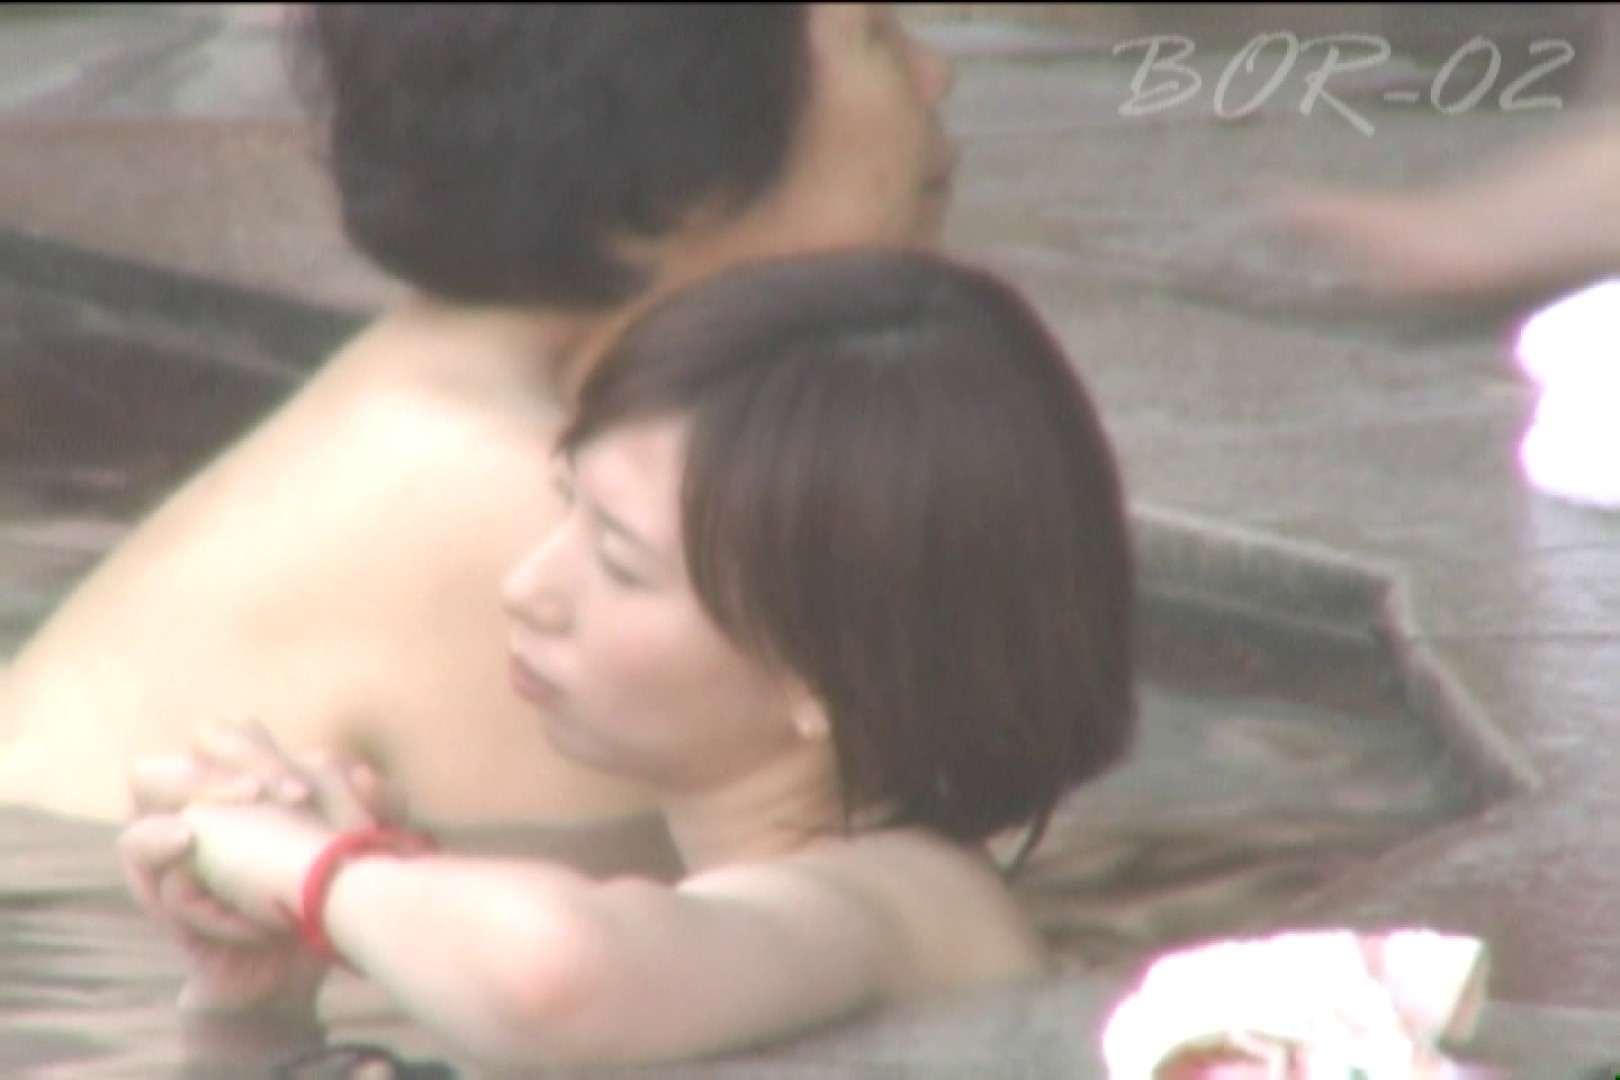 Aquaな露天風呂Vol.476 盗撮 濡れ場動画紹介 80画像 35